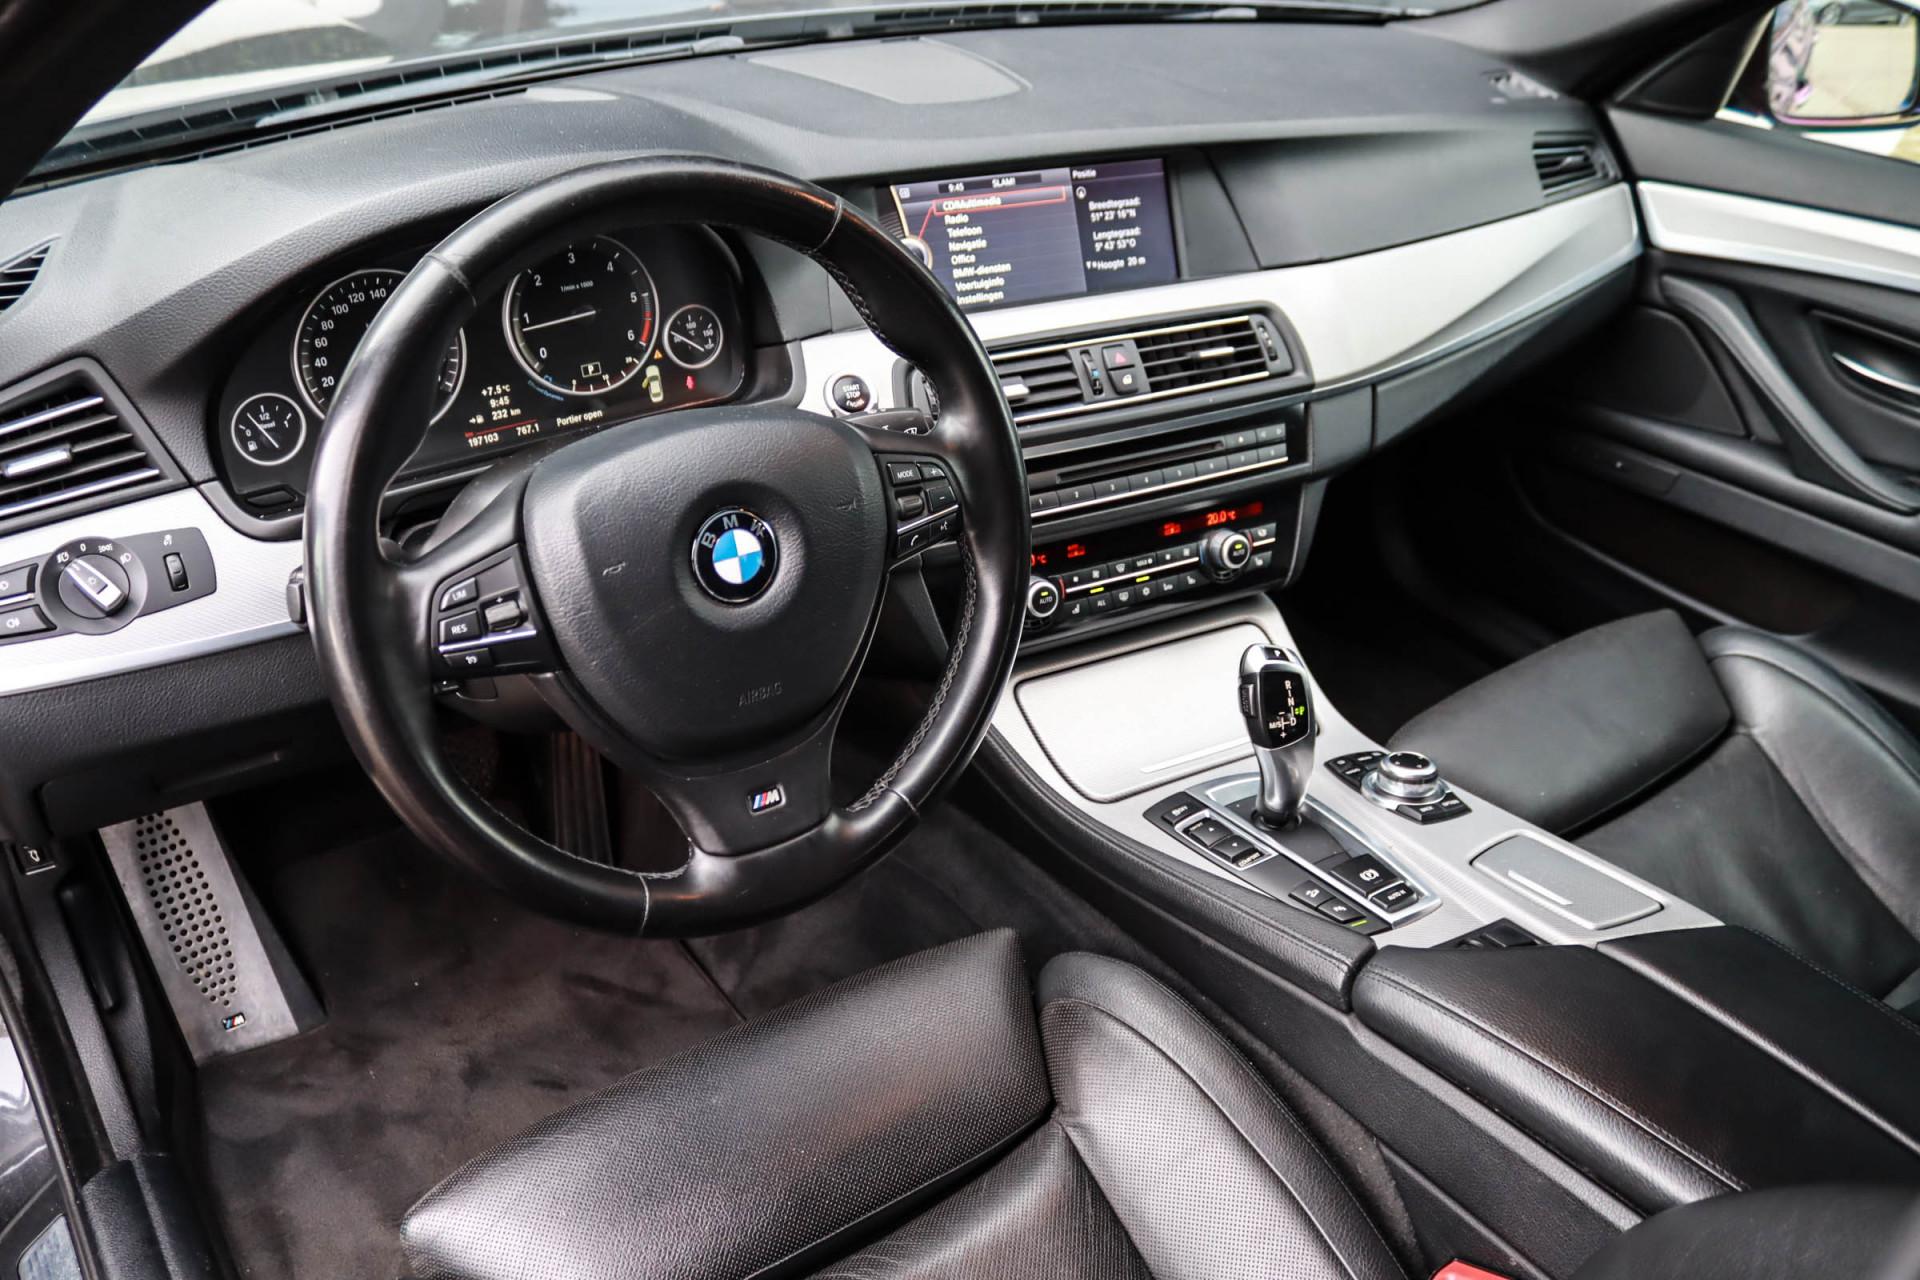 Tweedehands BMW-5 Serie occasion